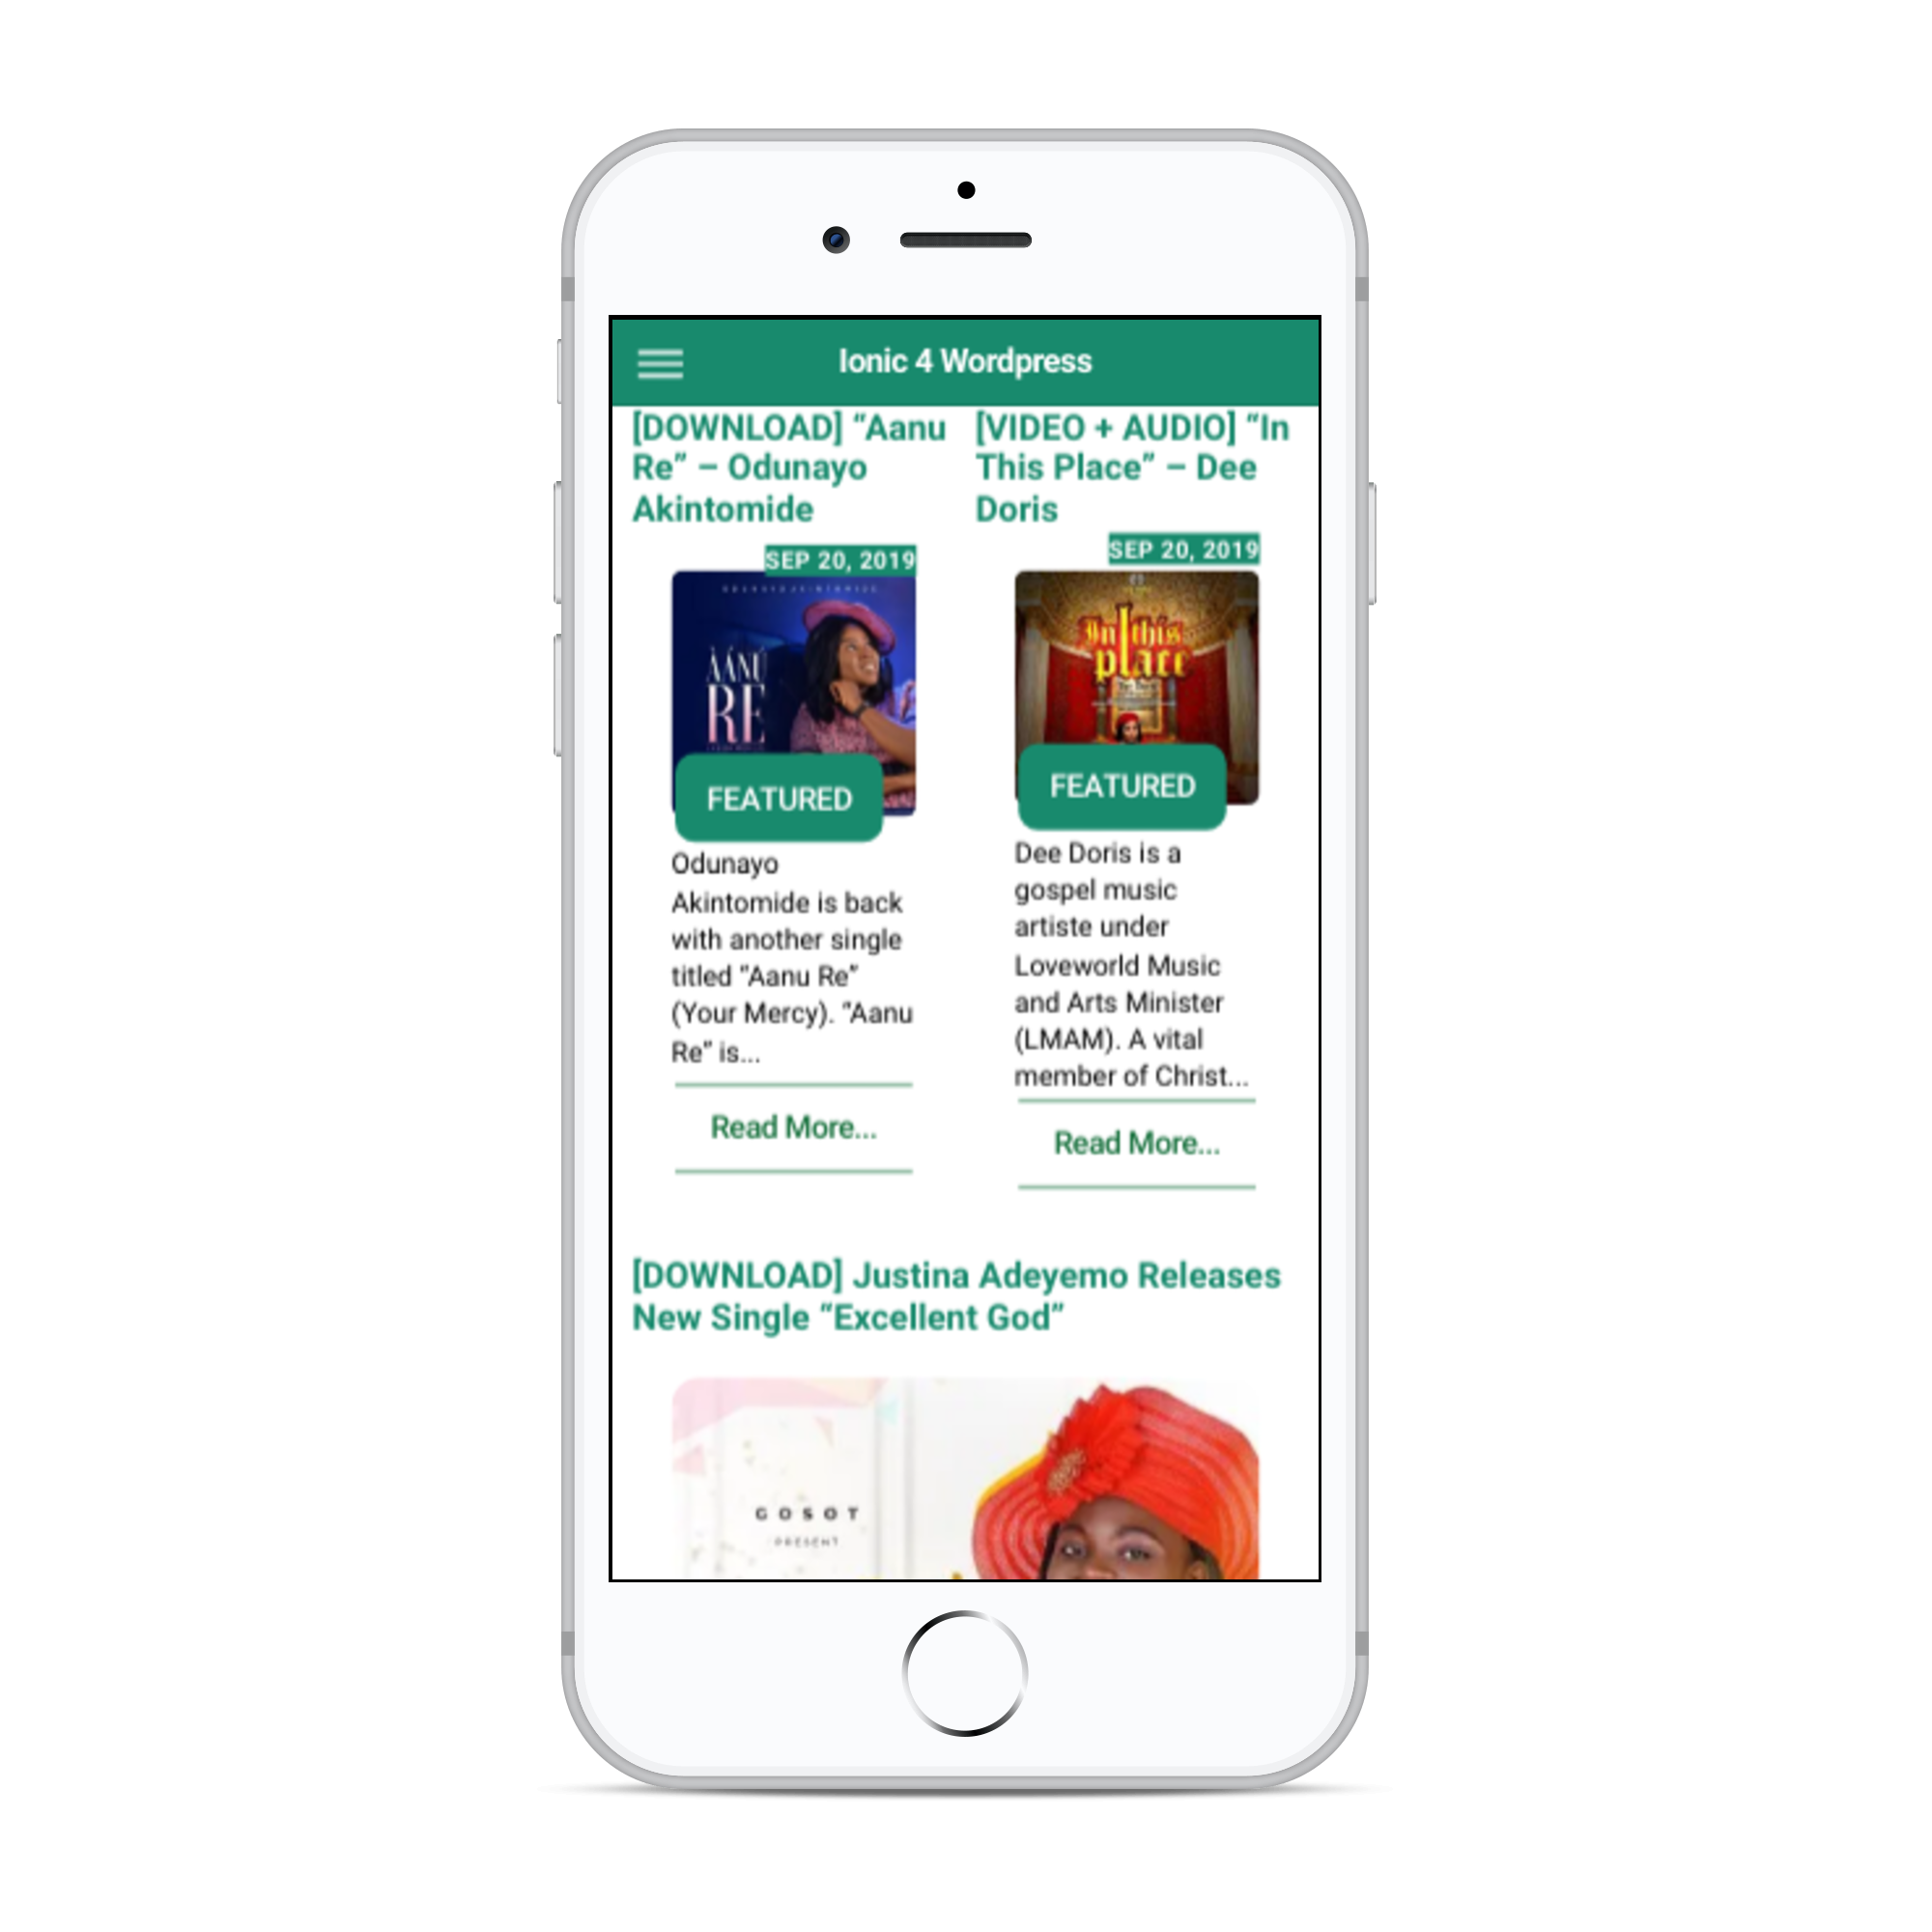 Ionic-4-Wordpress-News